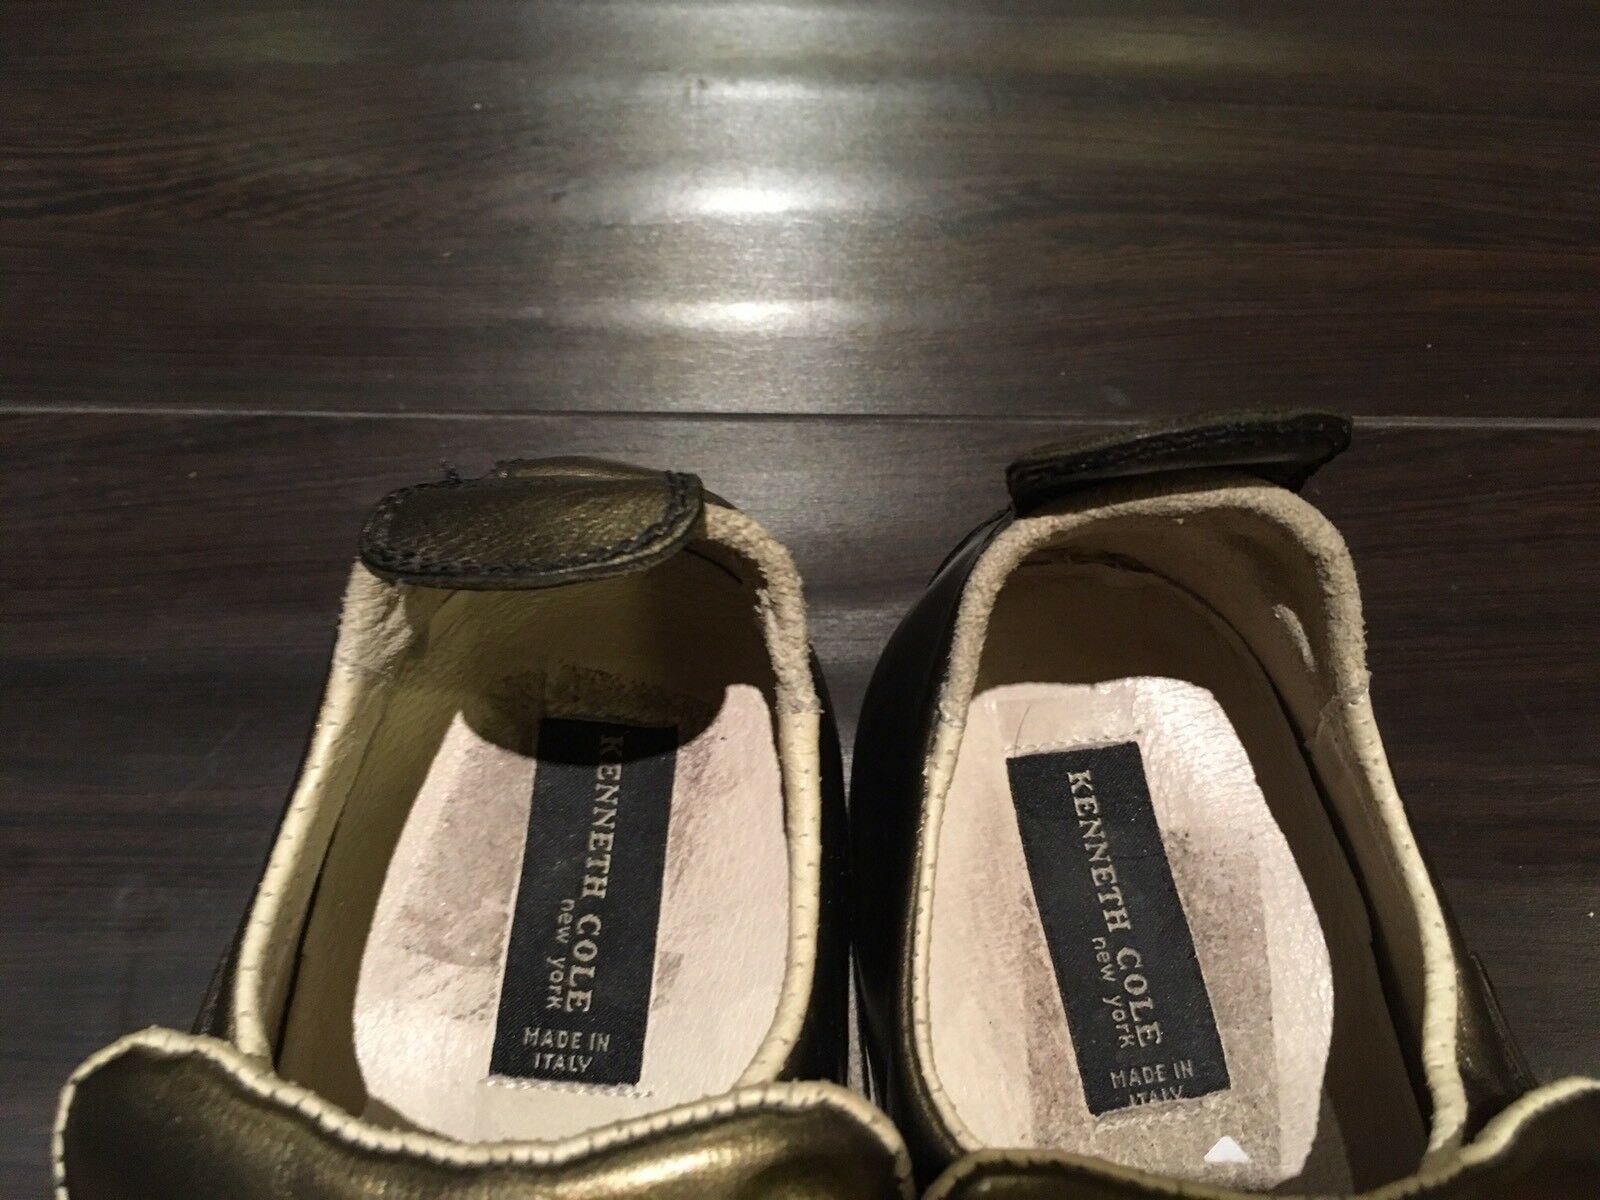 Kenneth Cole Cole Cole Uomo Pelle Scarpe, Taglia 9, Made in ITALY, Rare Style c29d74